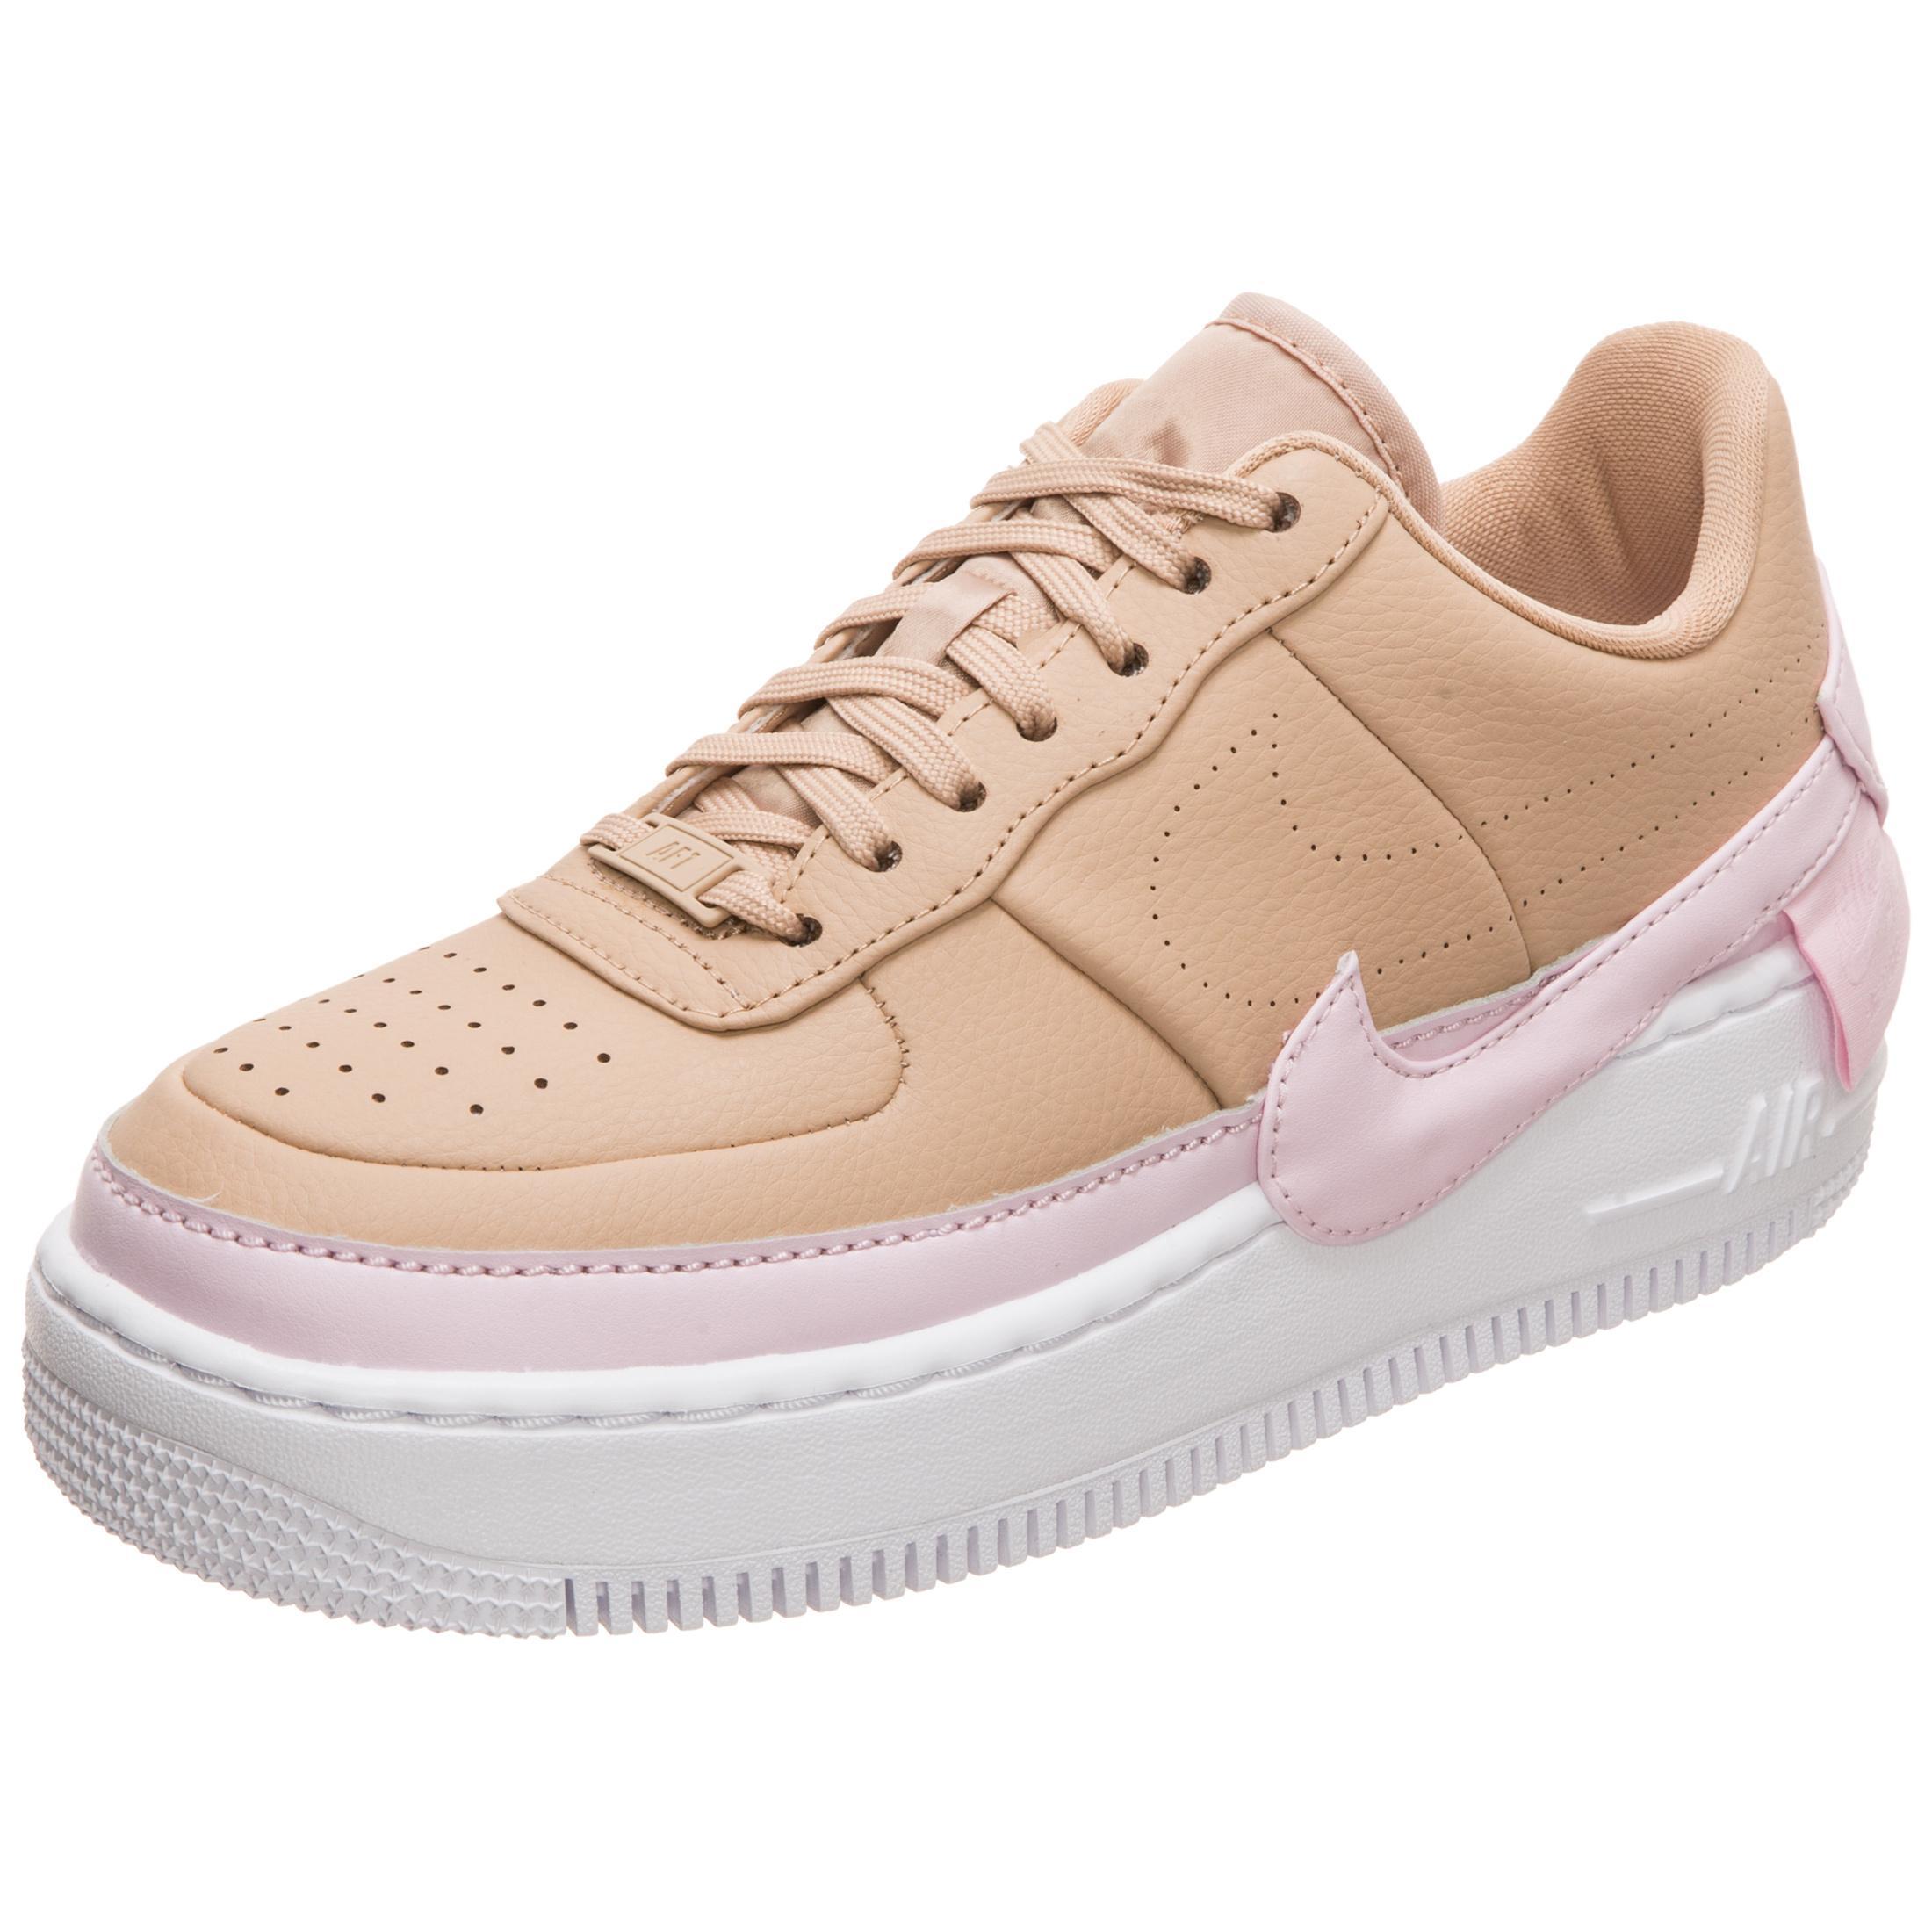 nike air force beige damen